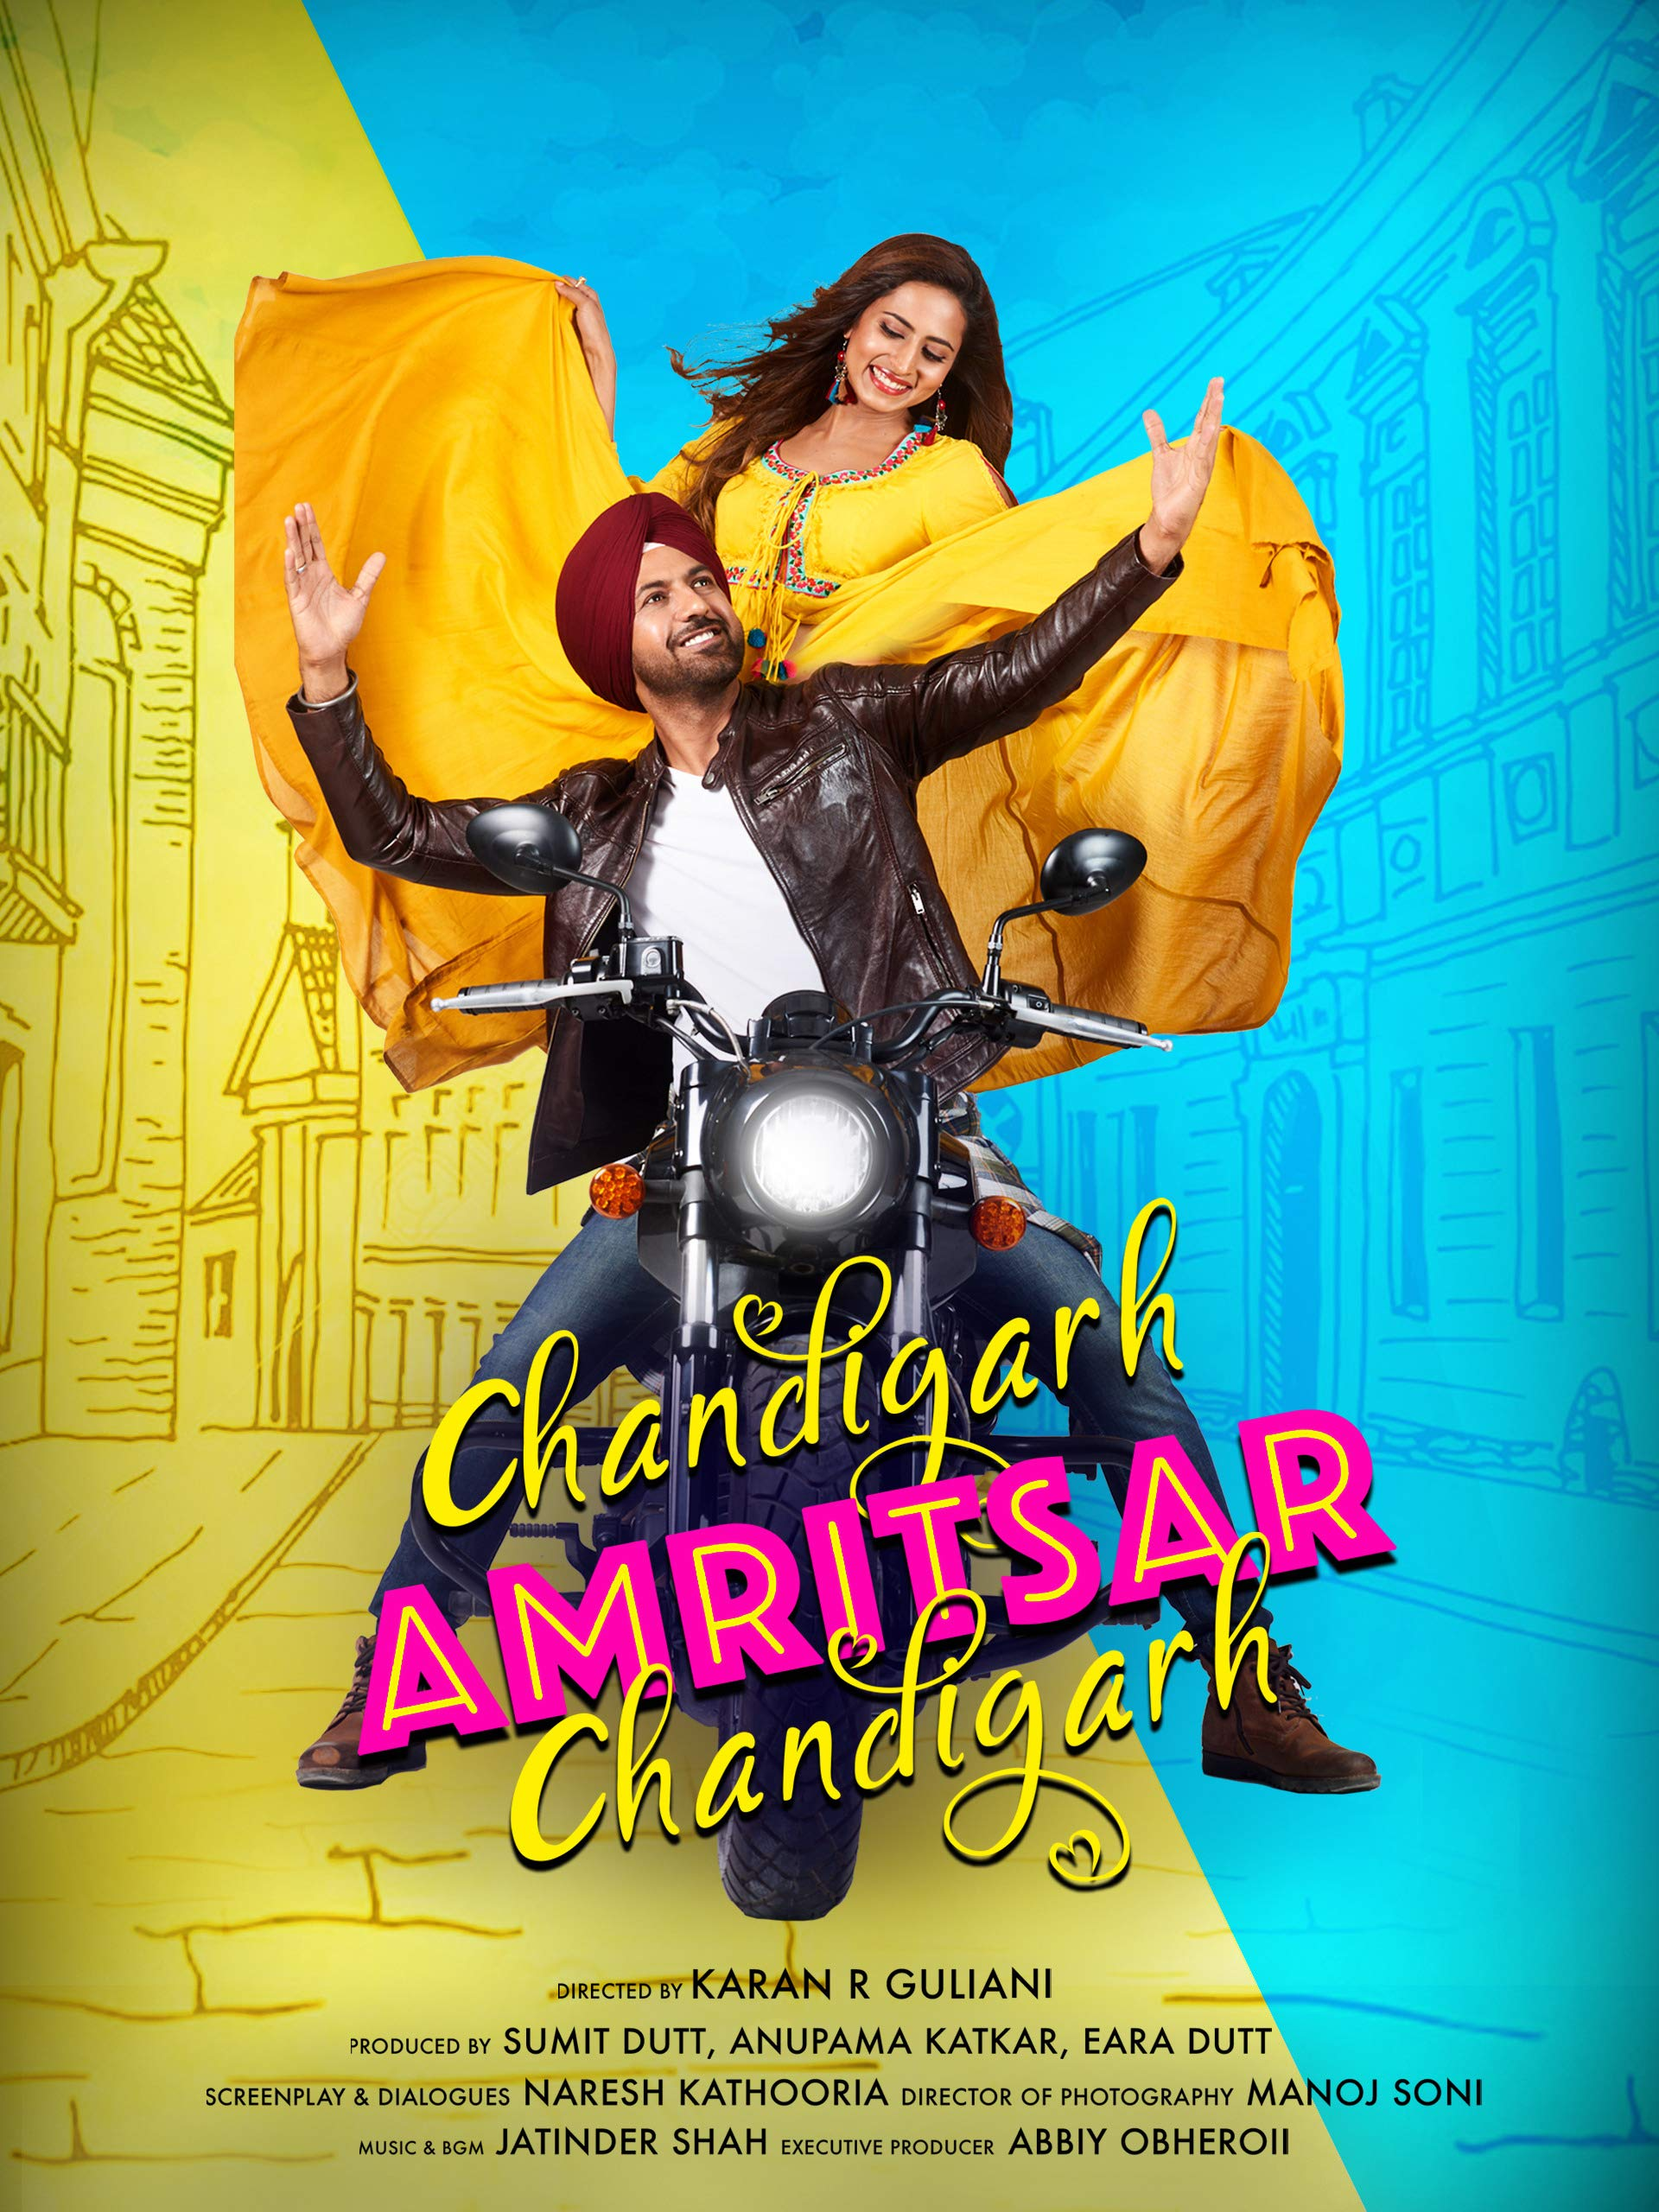 Chandigarh Amritsar Chandigarh on Amazon Prime Video UK